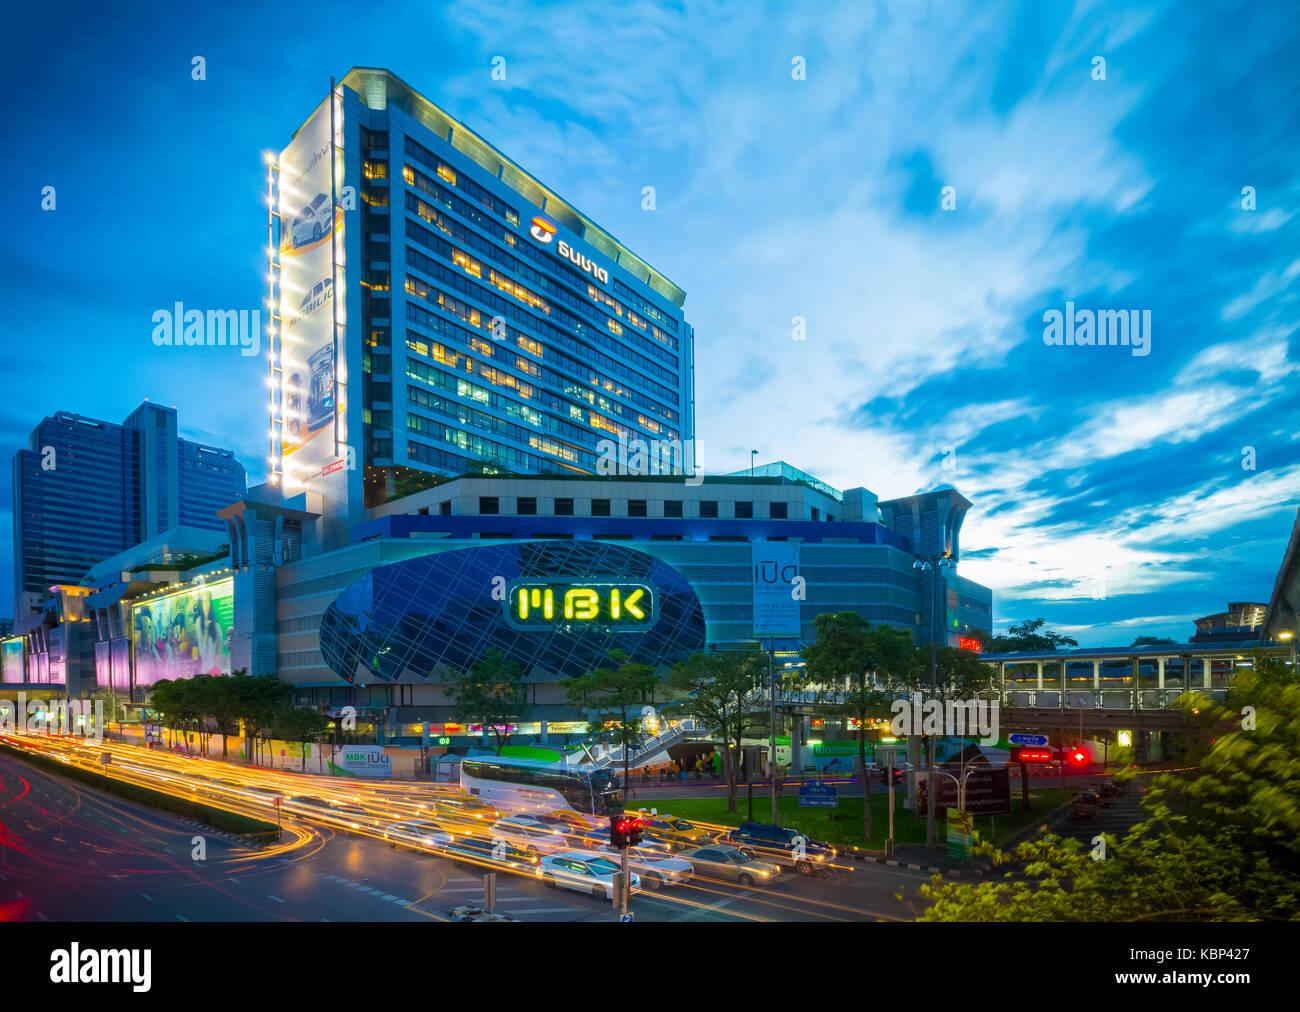 The Top 10 Things to Do Near Baiyoke Sky Hotel, Bangkok